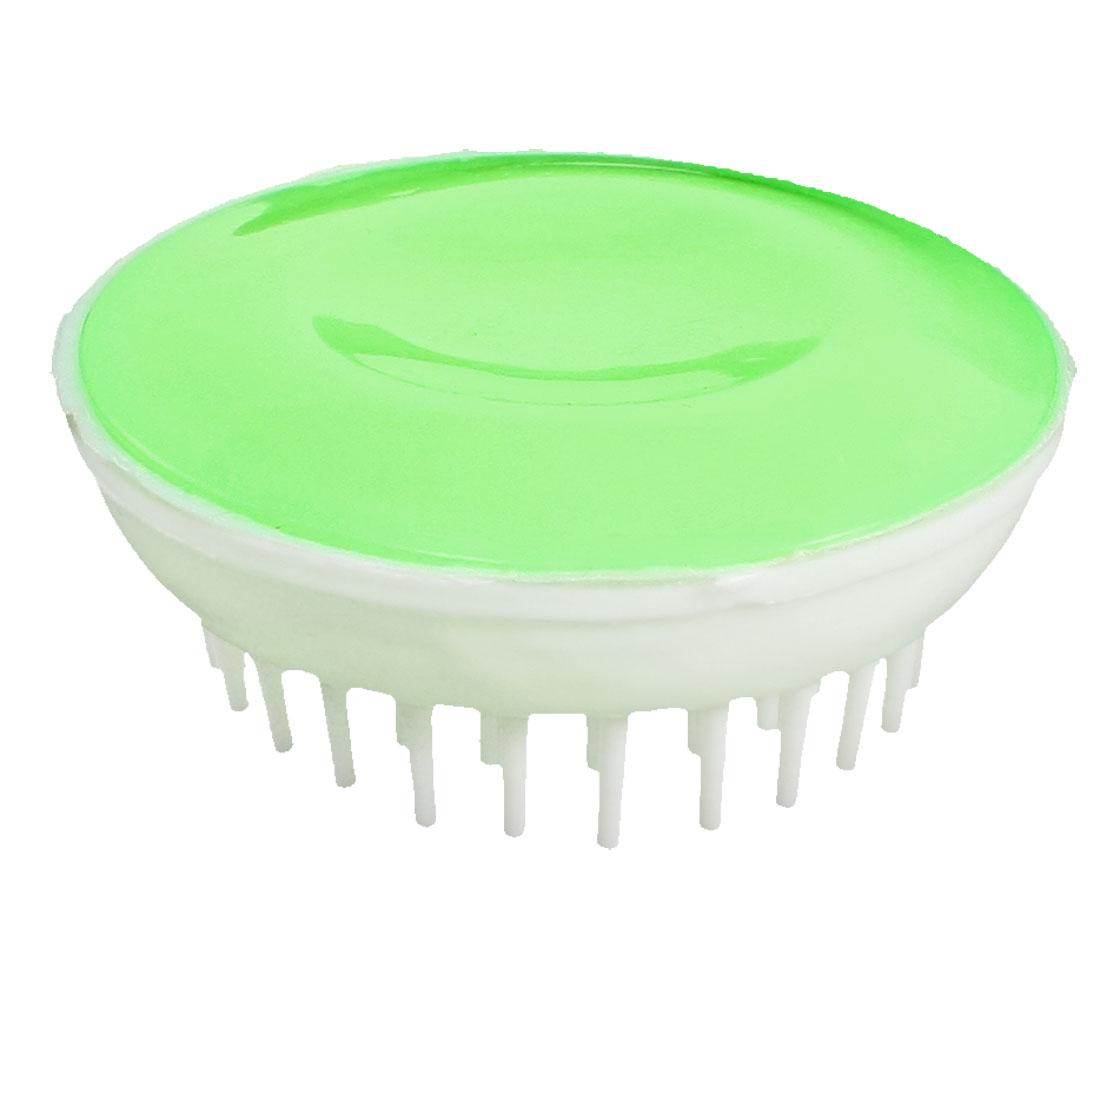 "2.8"" Dia Green White Hair Scalp Body Massage Massager Shampoo Brush Comb"